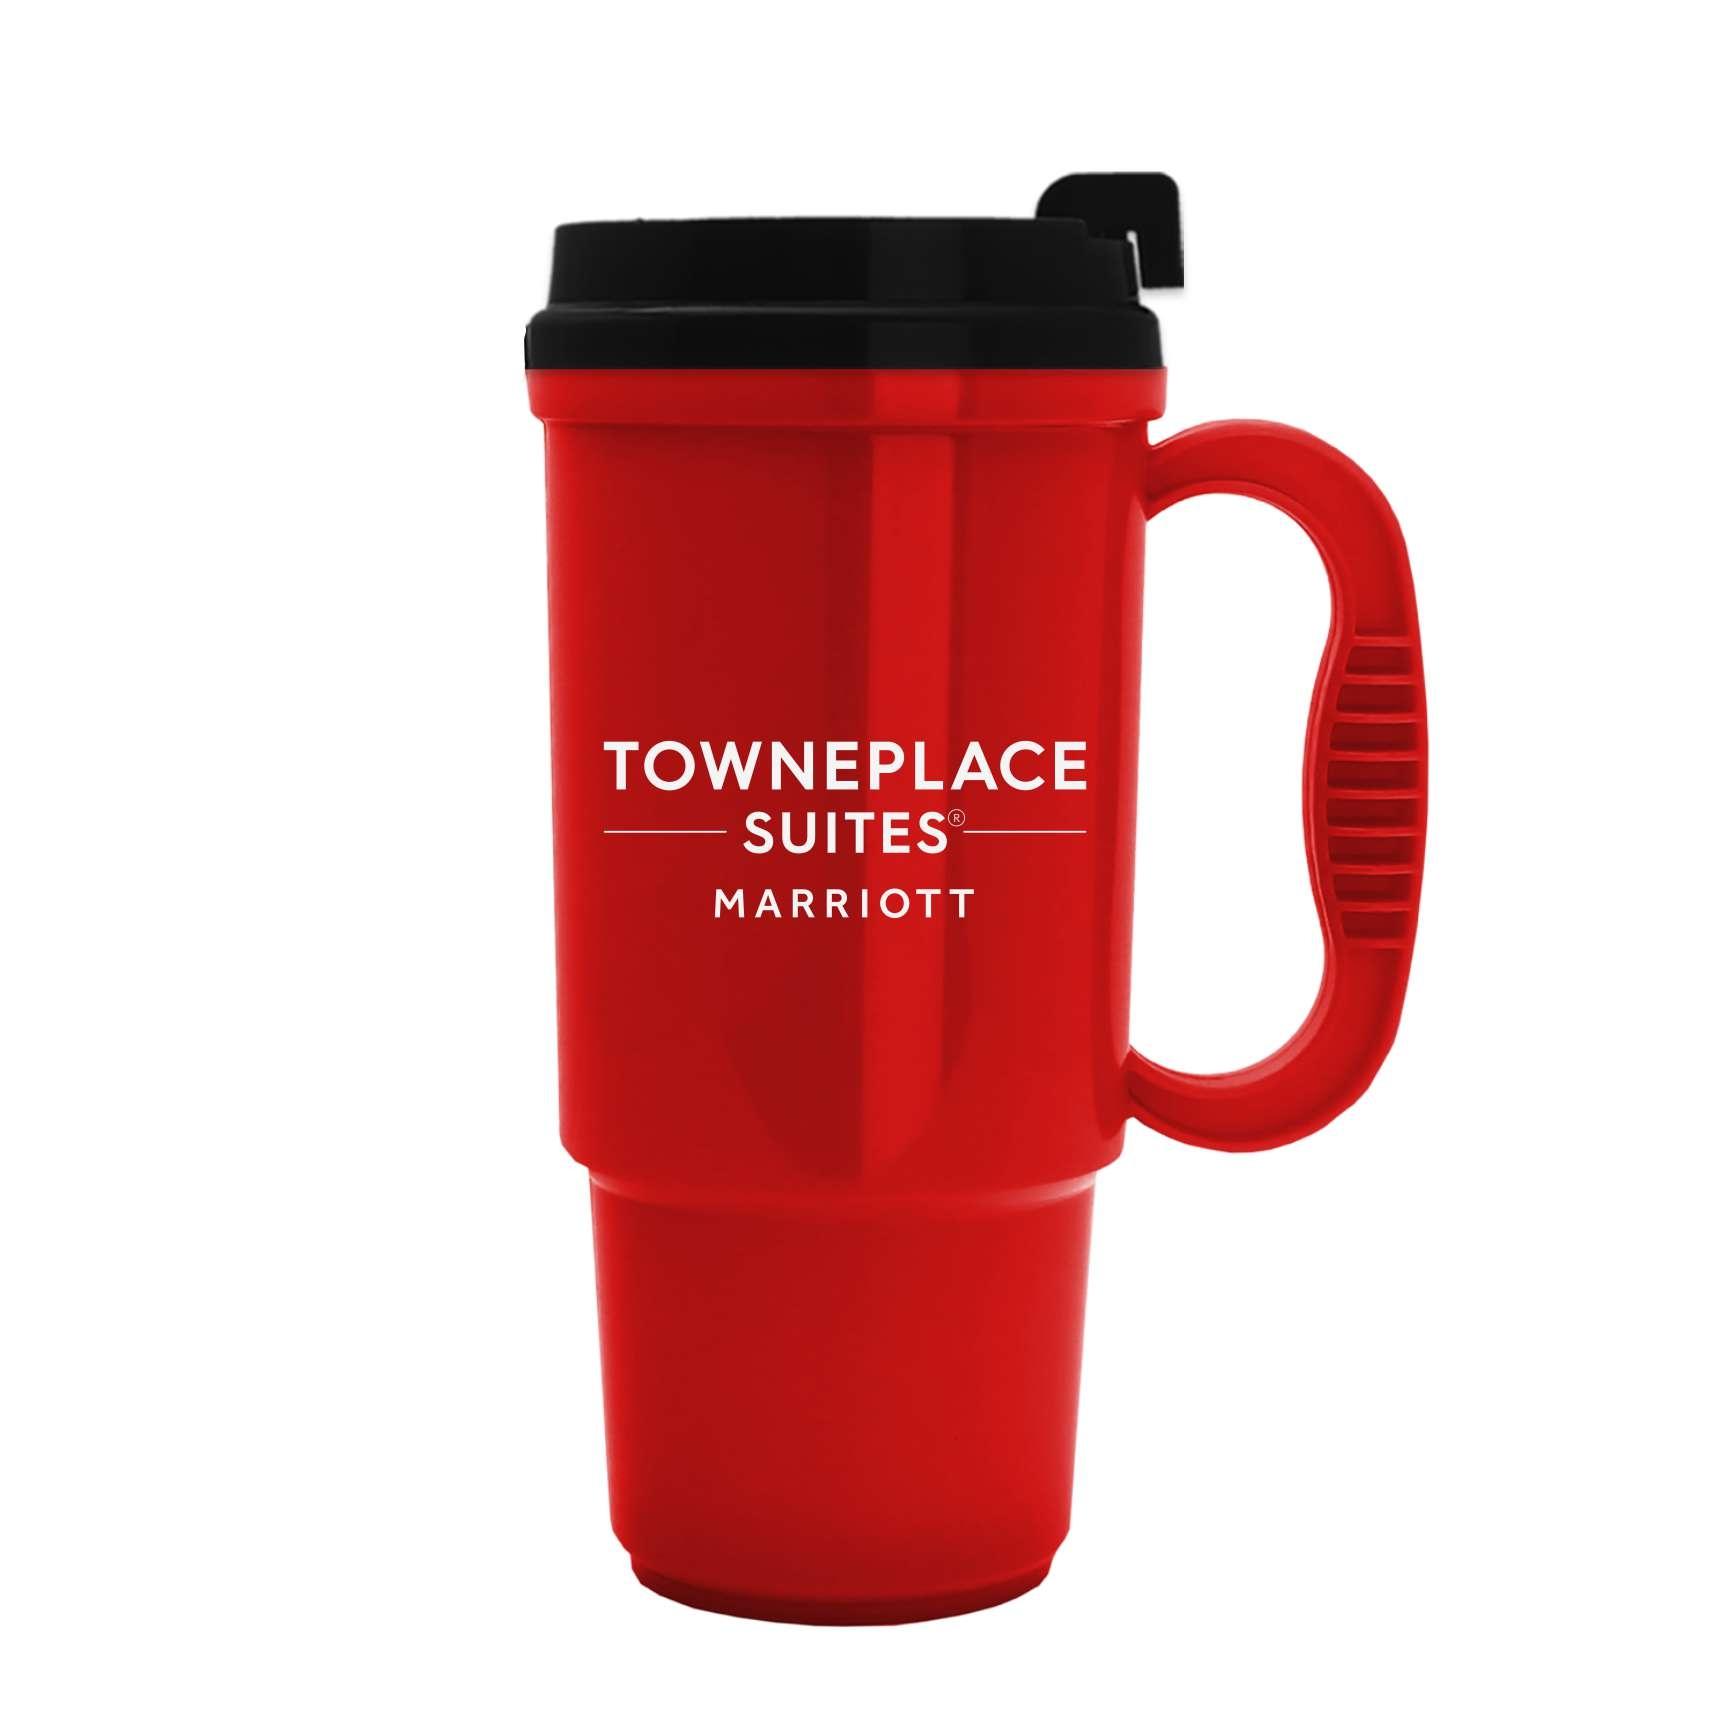 Travel Mugs. 16oz. | Insulated | No Spill Lid | 2 Sided Logo | BPA Free & FDA Compliant | Dishwasher Safe